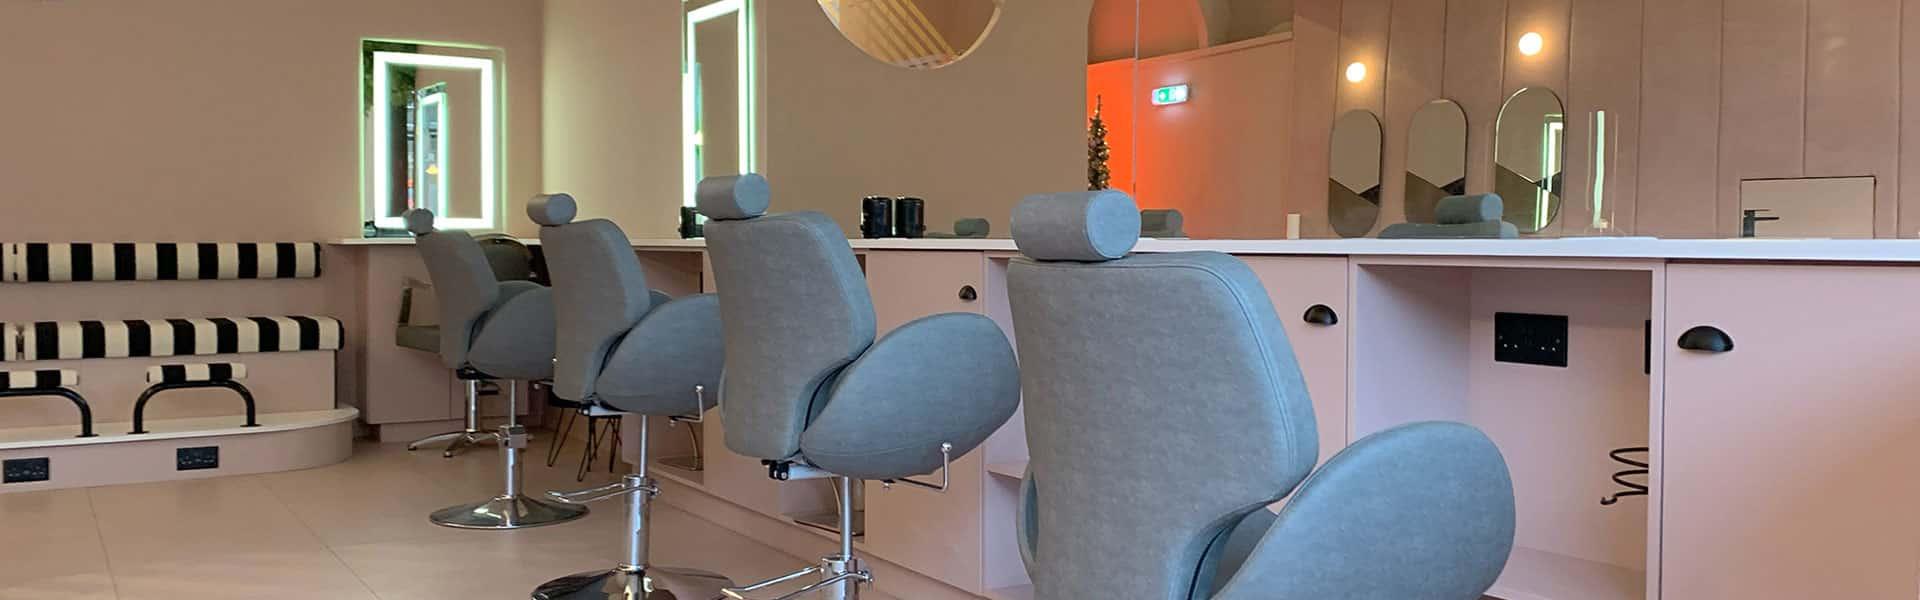 JasminFrench inside the beauty salon edinburgh